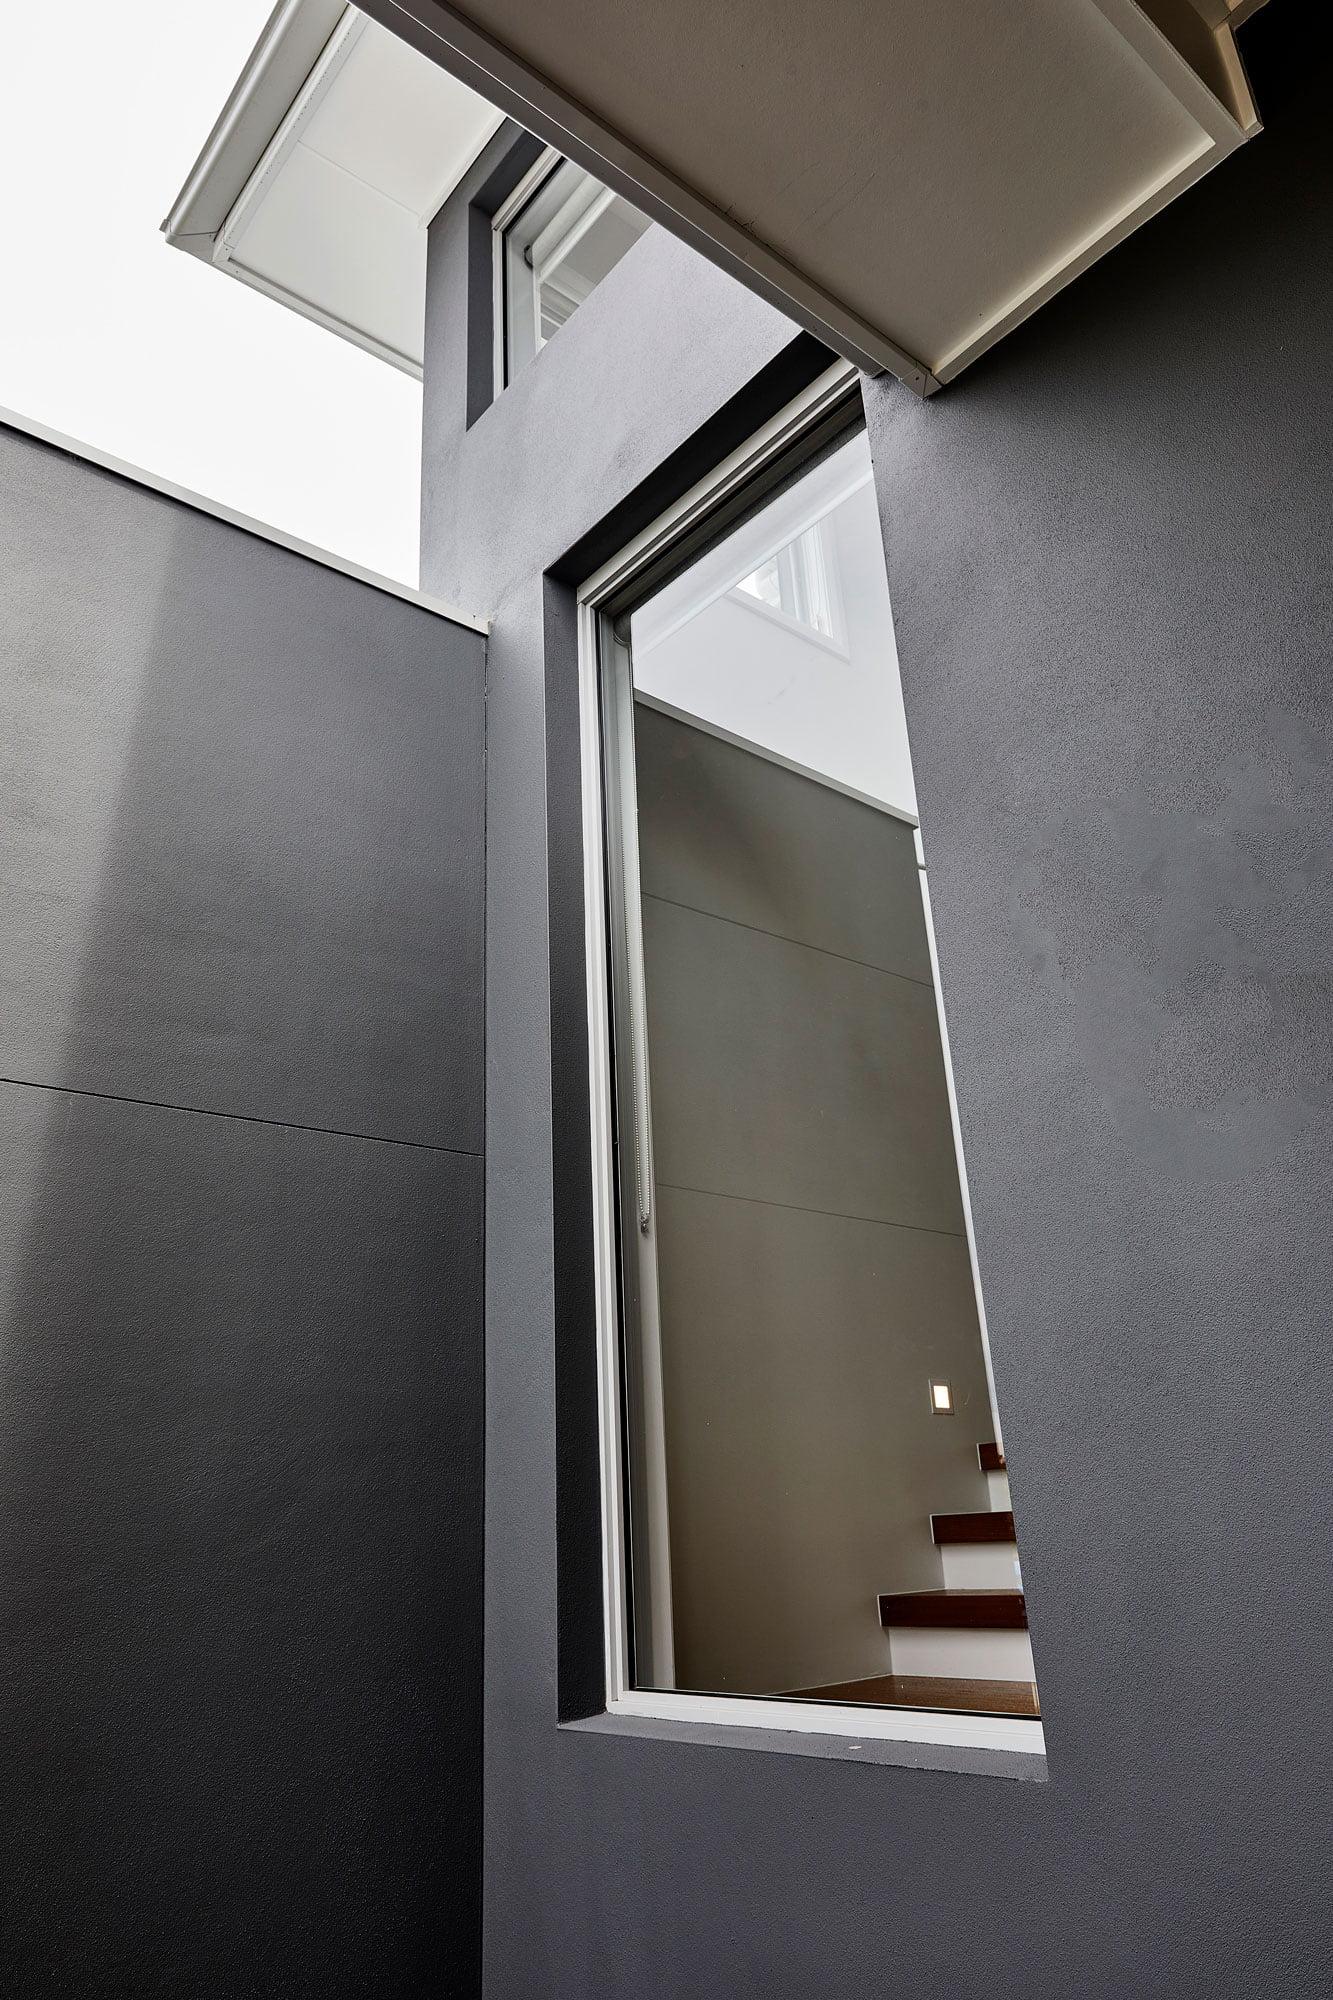 Horizon fixed windows in Shale Grey